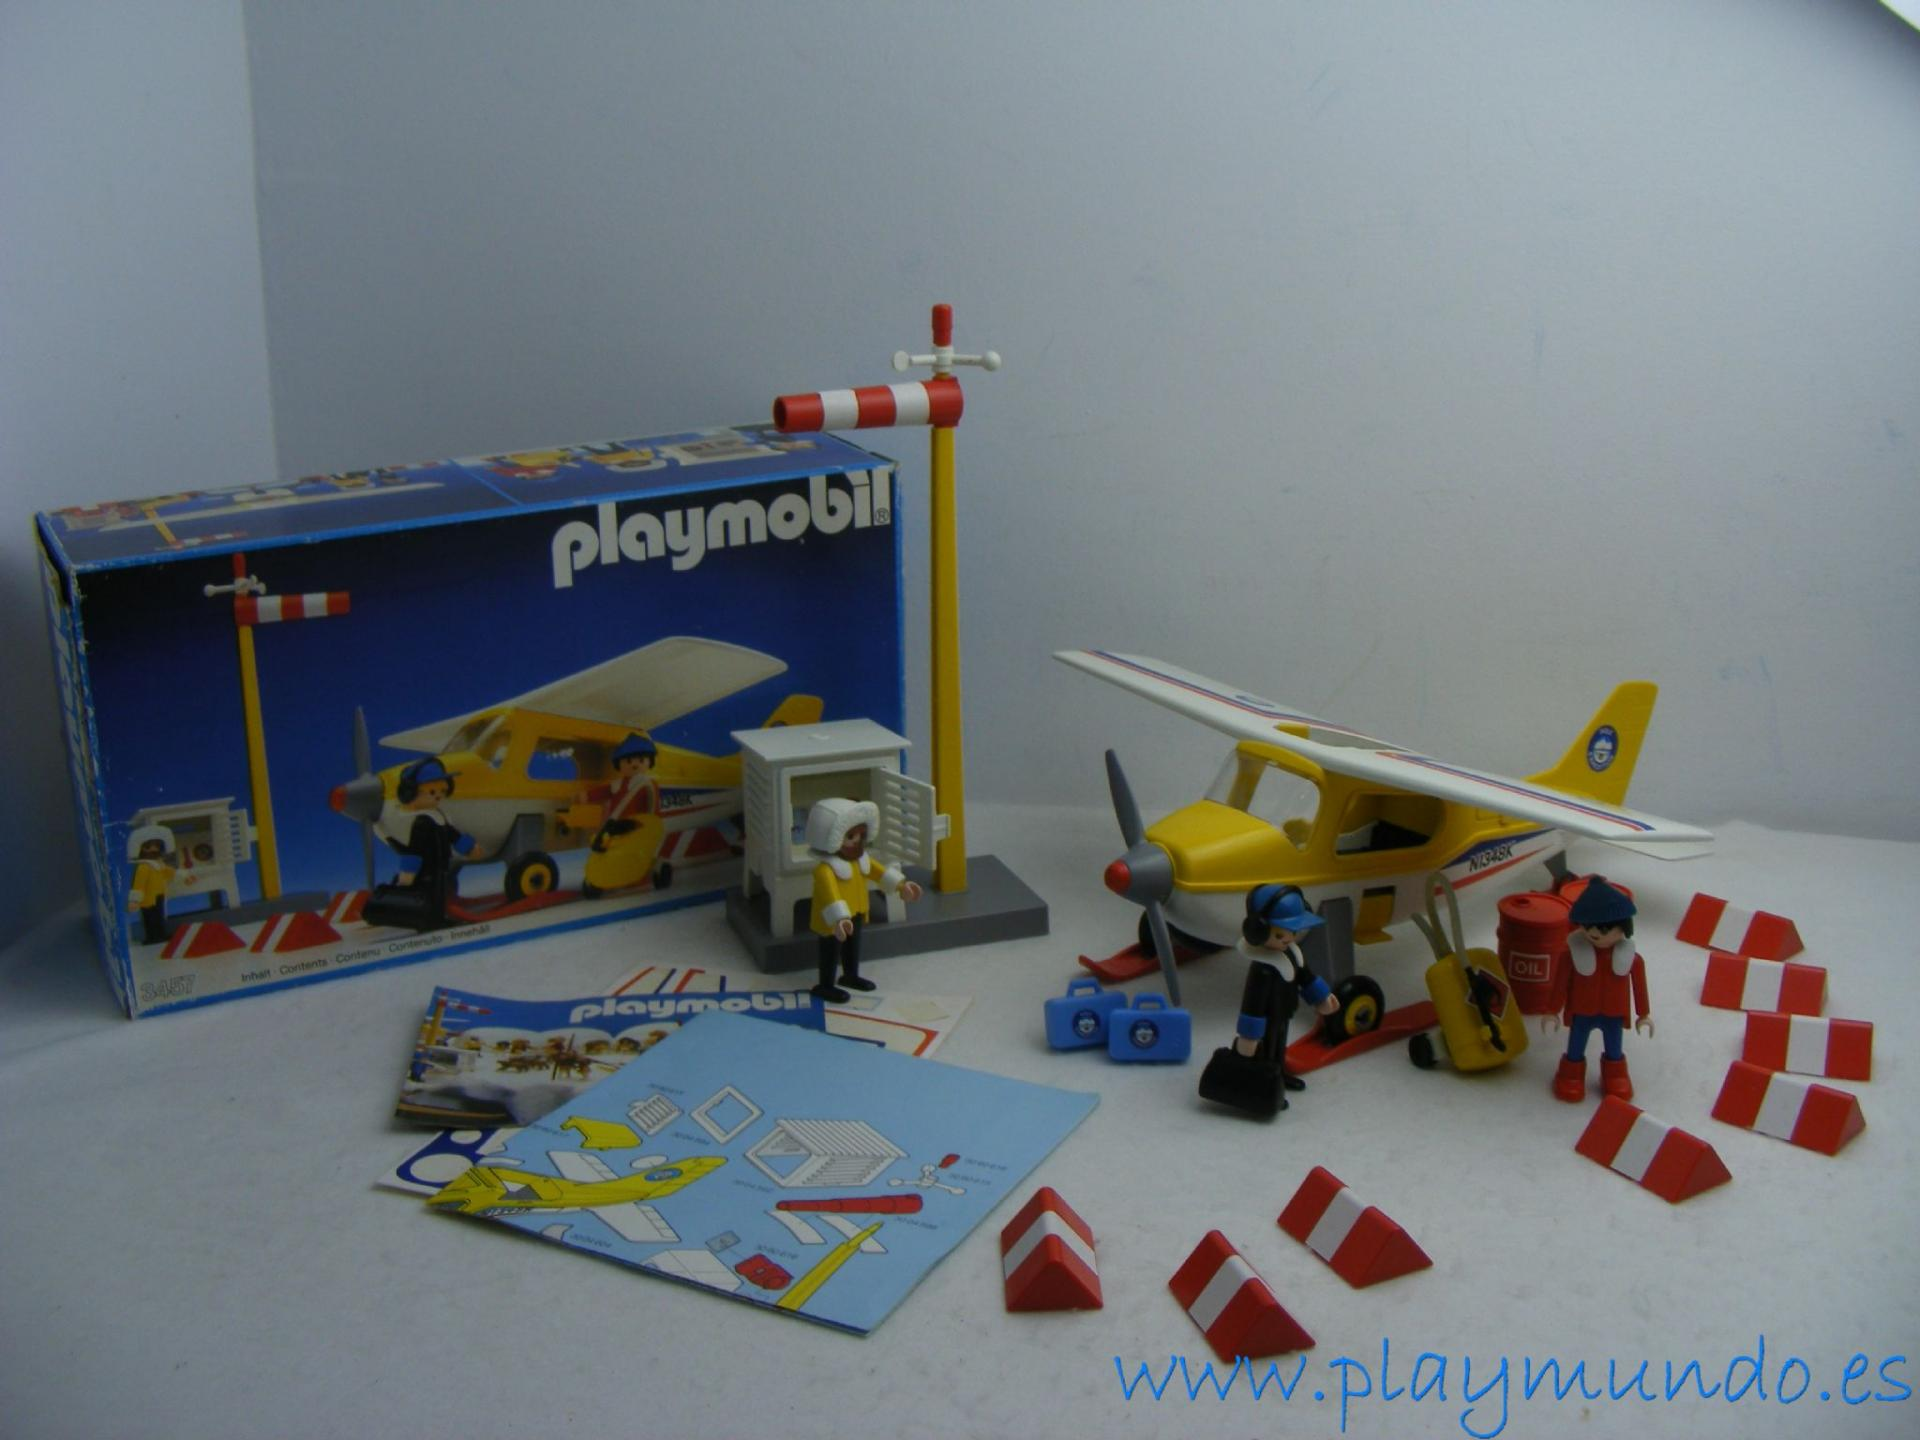 PLAYMOBIL 3457 AVION EXPEDICION POLO NORTE AVIONETA SKIS ESTACION  (AÑO 1986 - 1990)